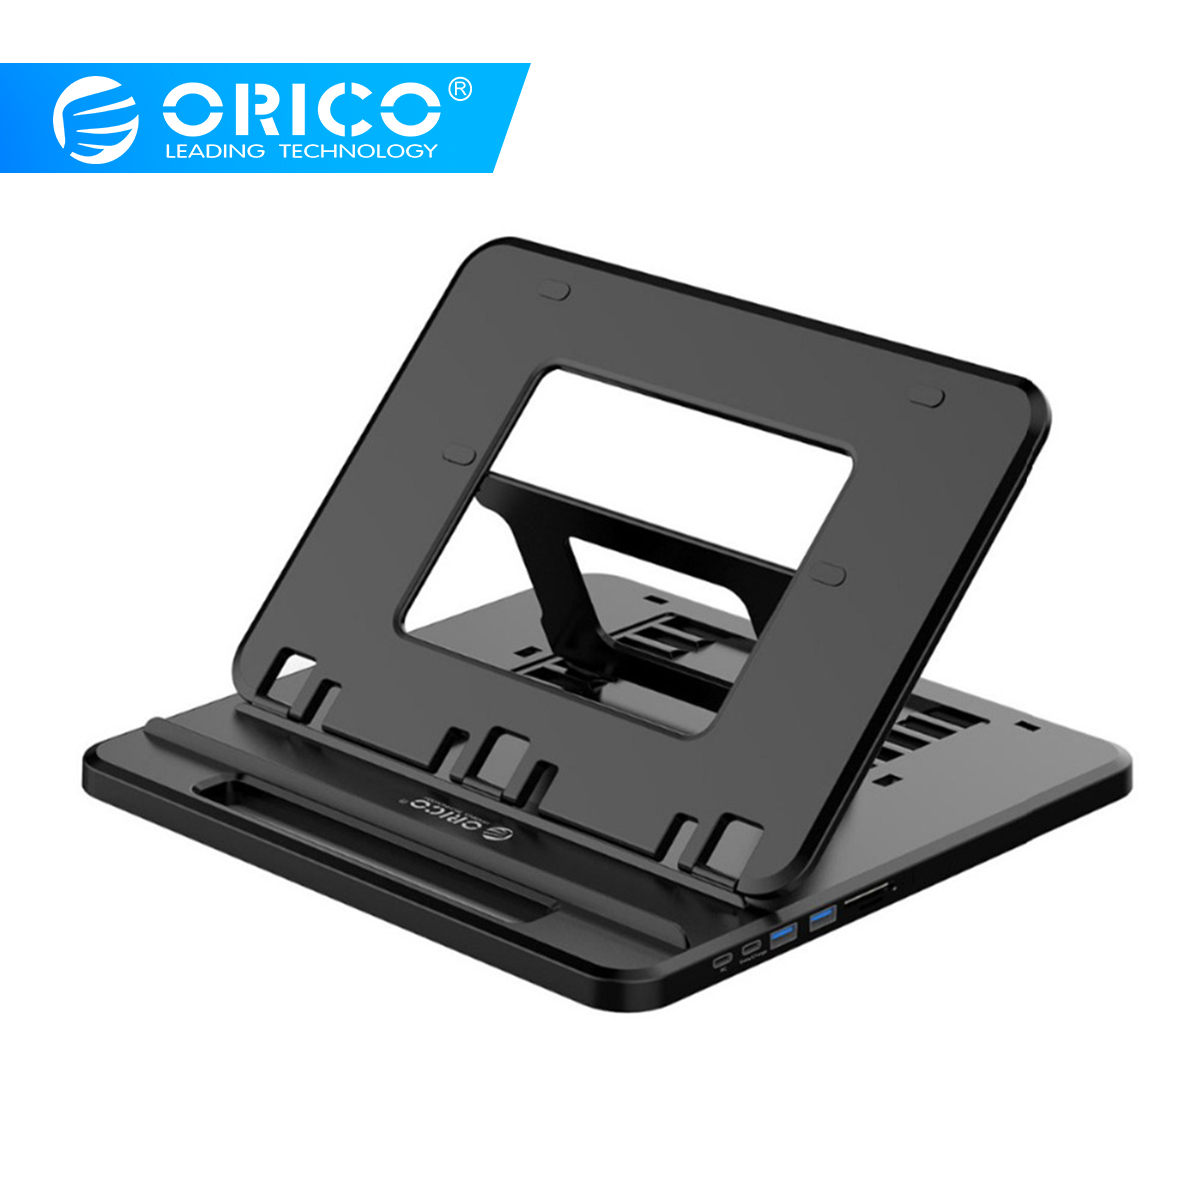 ORICO แล็ปท็อปแท็บเล็ตผู้ถือขาตั้งผู้ถือ Office สำหรับโทรศัพท์ Charge สำหรับ iPhone แท็บเล็ตขาตั้ง ipad Type  C SD TF-ใน ขาตั้งแท็บเล็ต จาก คอมพิวเตอร์และออฟฟิศ บน AliExpress - 11.11_สิบเอ็ด สิบเอ็ดวันคนโสด 1